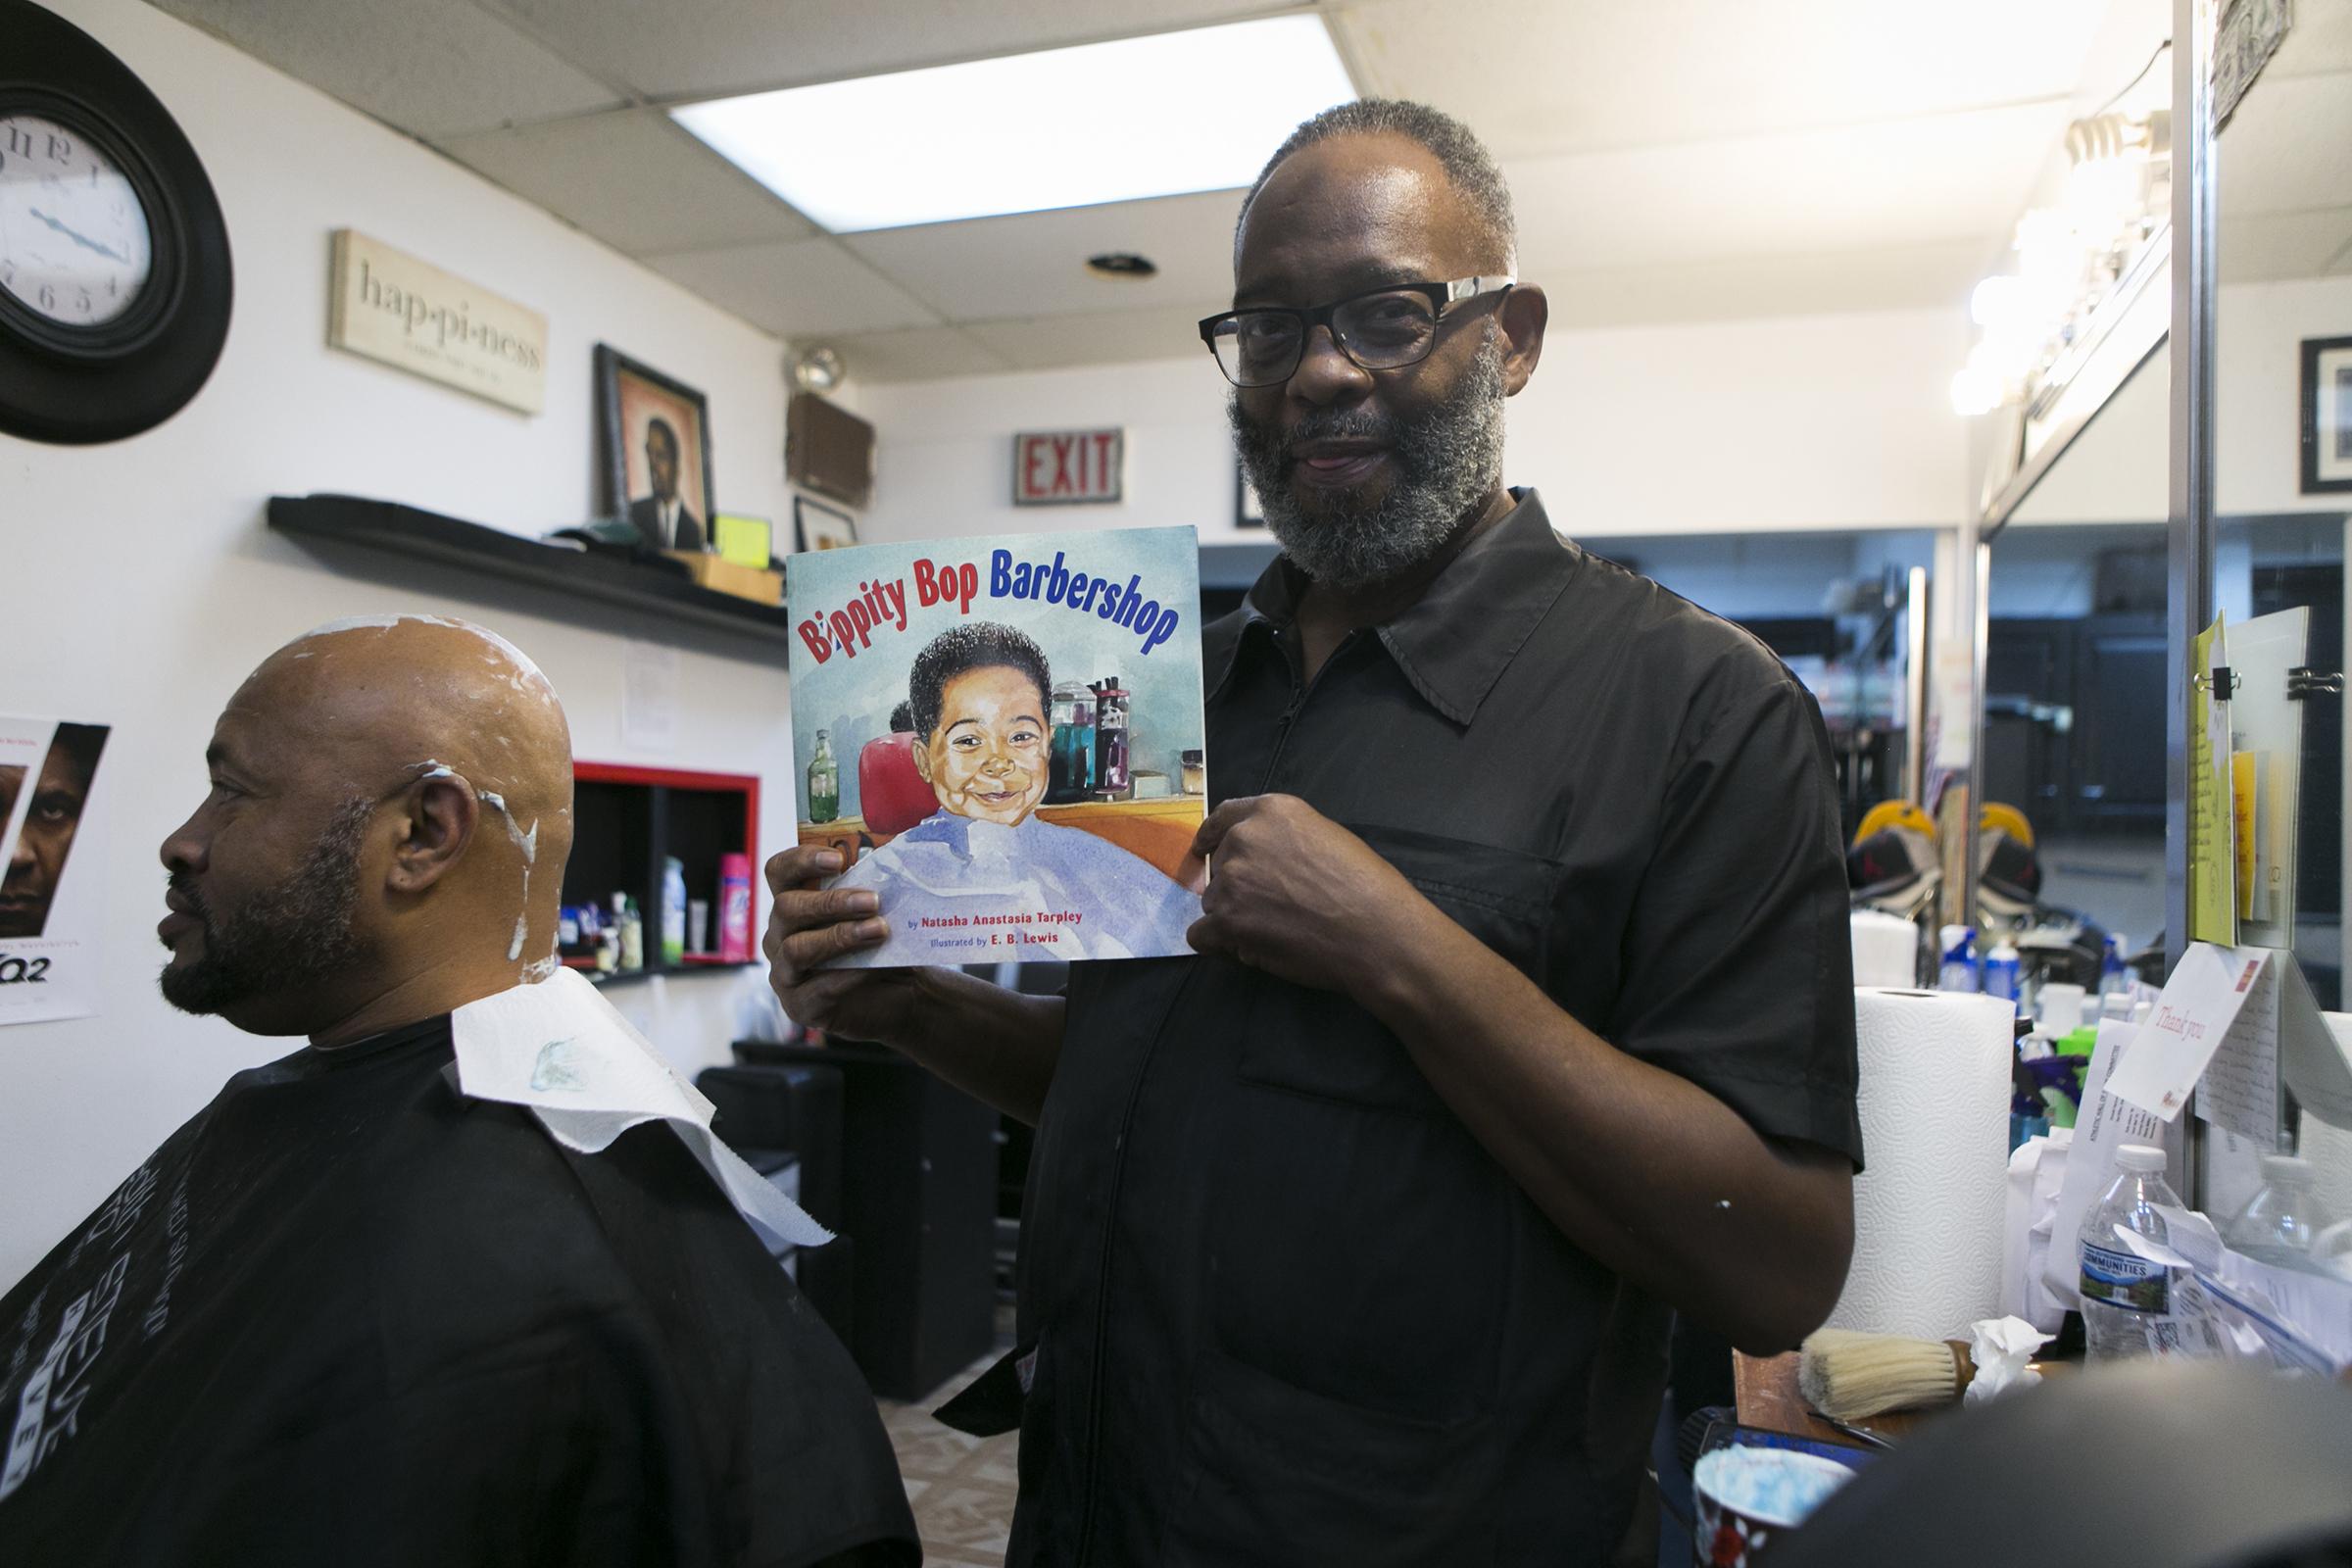 Leroy Robinson Jr., owner of Leroy´s Barbershop on Lancaster Avenue, poses with one of his favorite books, Bibbity Bop Barbershop.